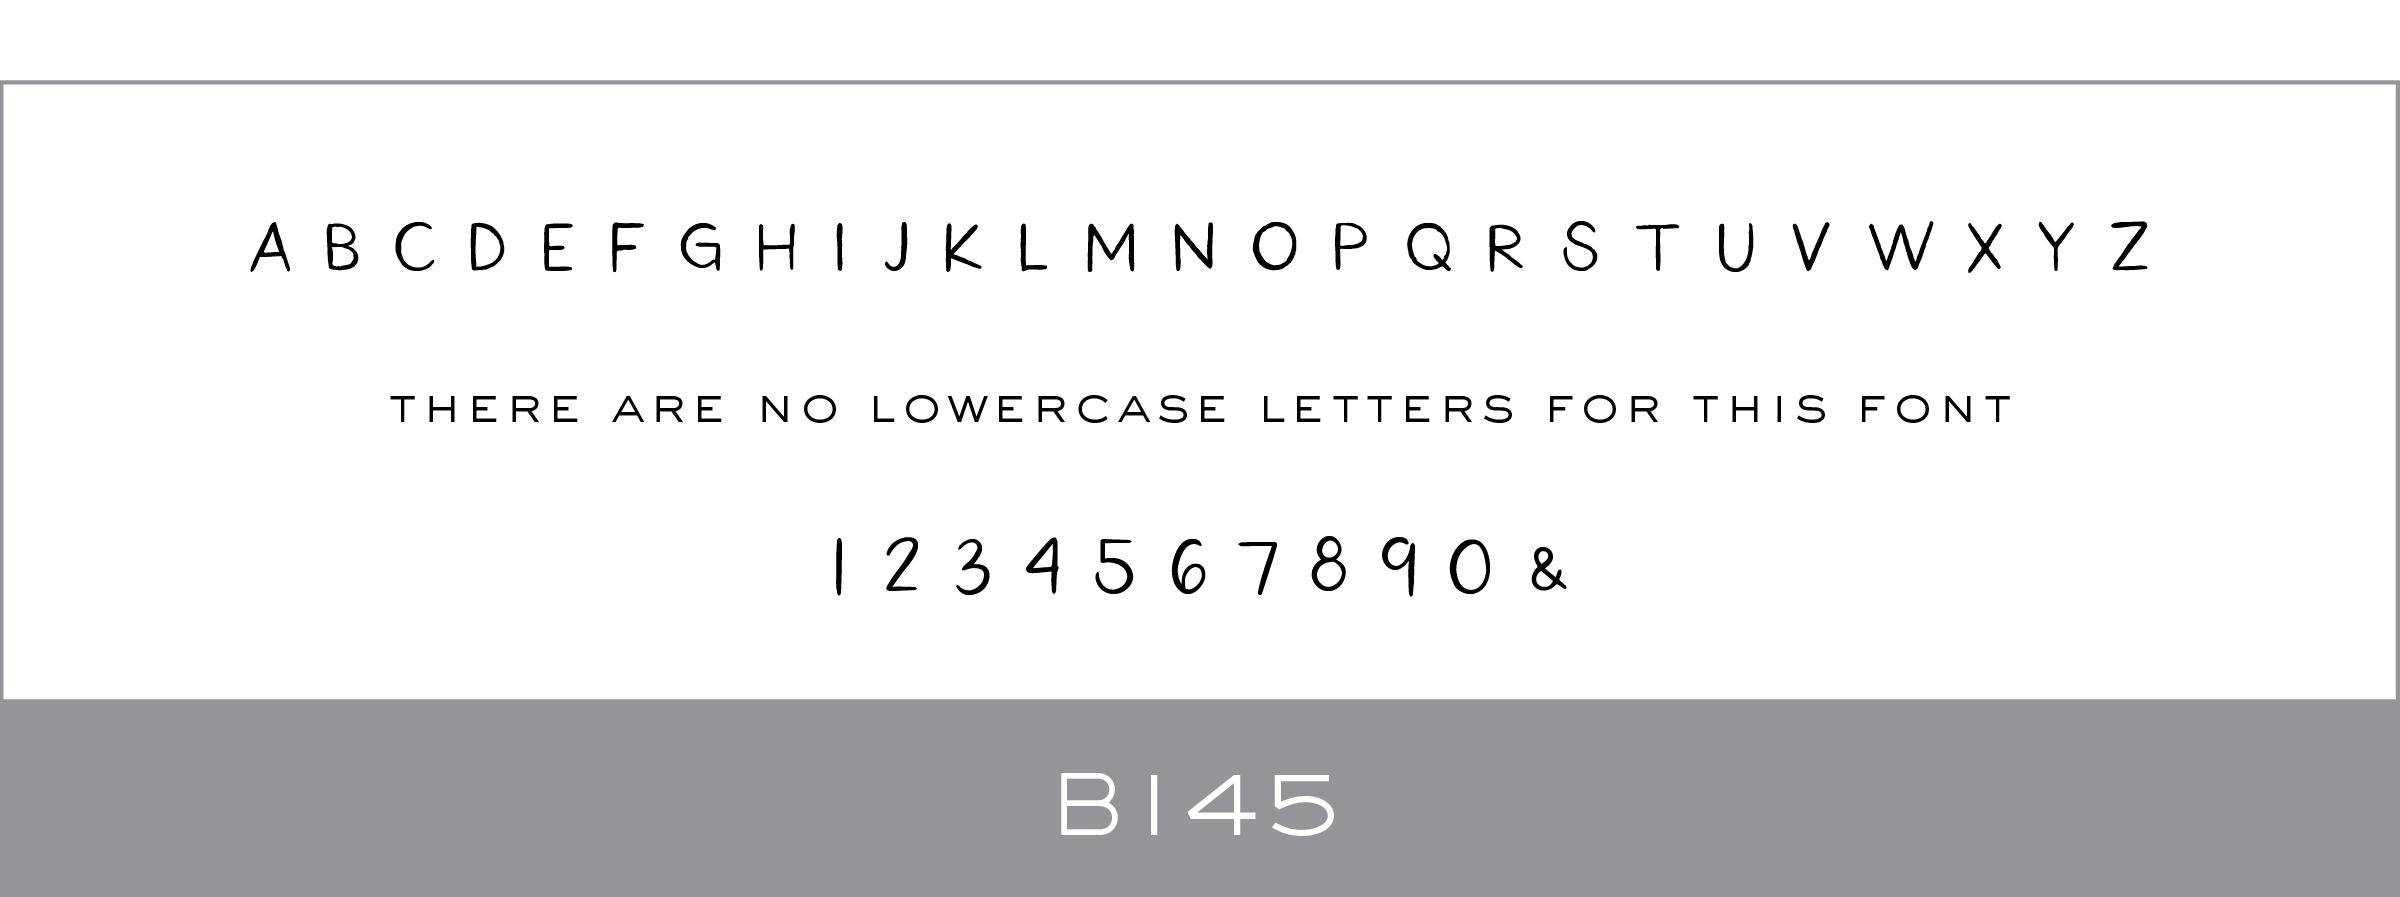 B145_Haute_Papier_Font.jpg